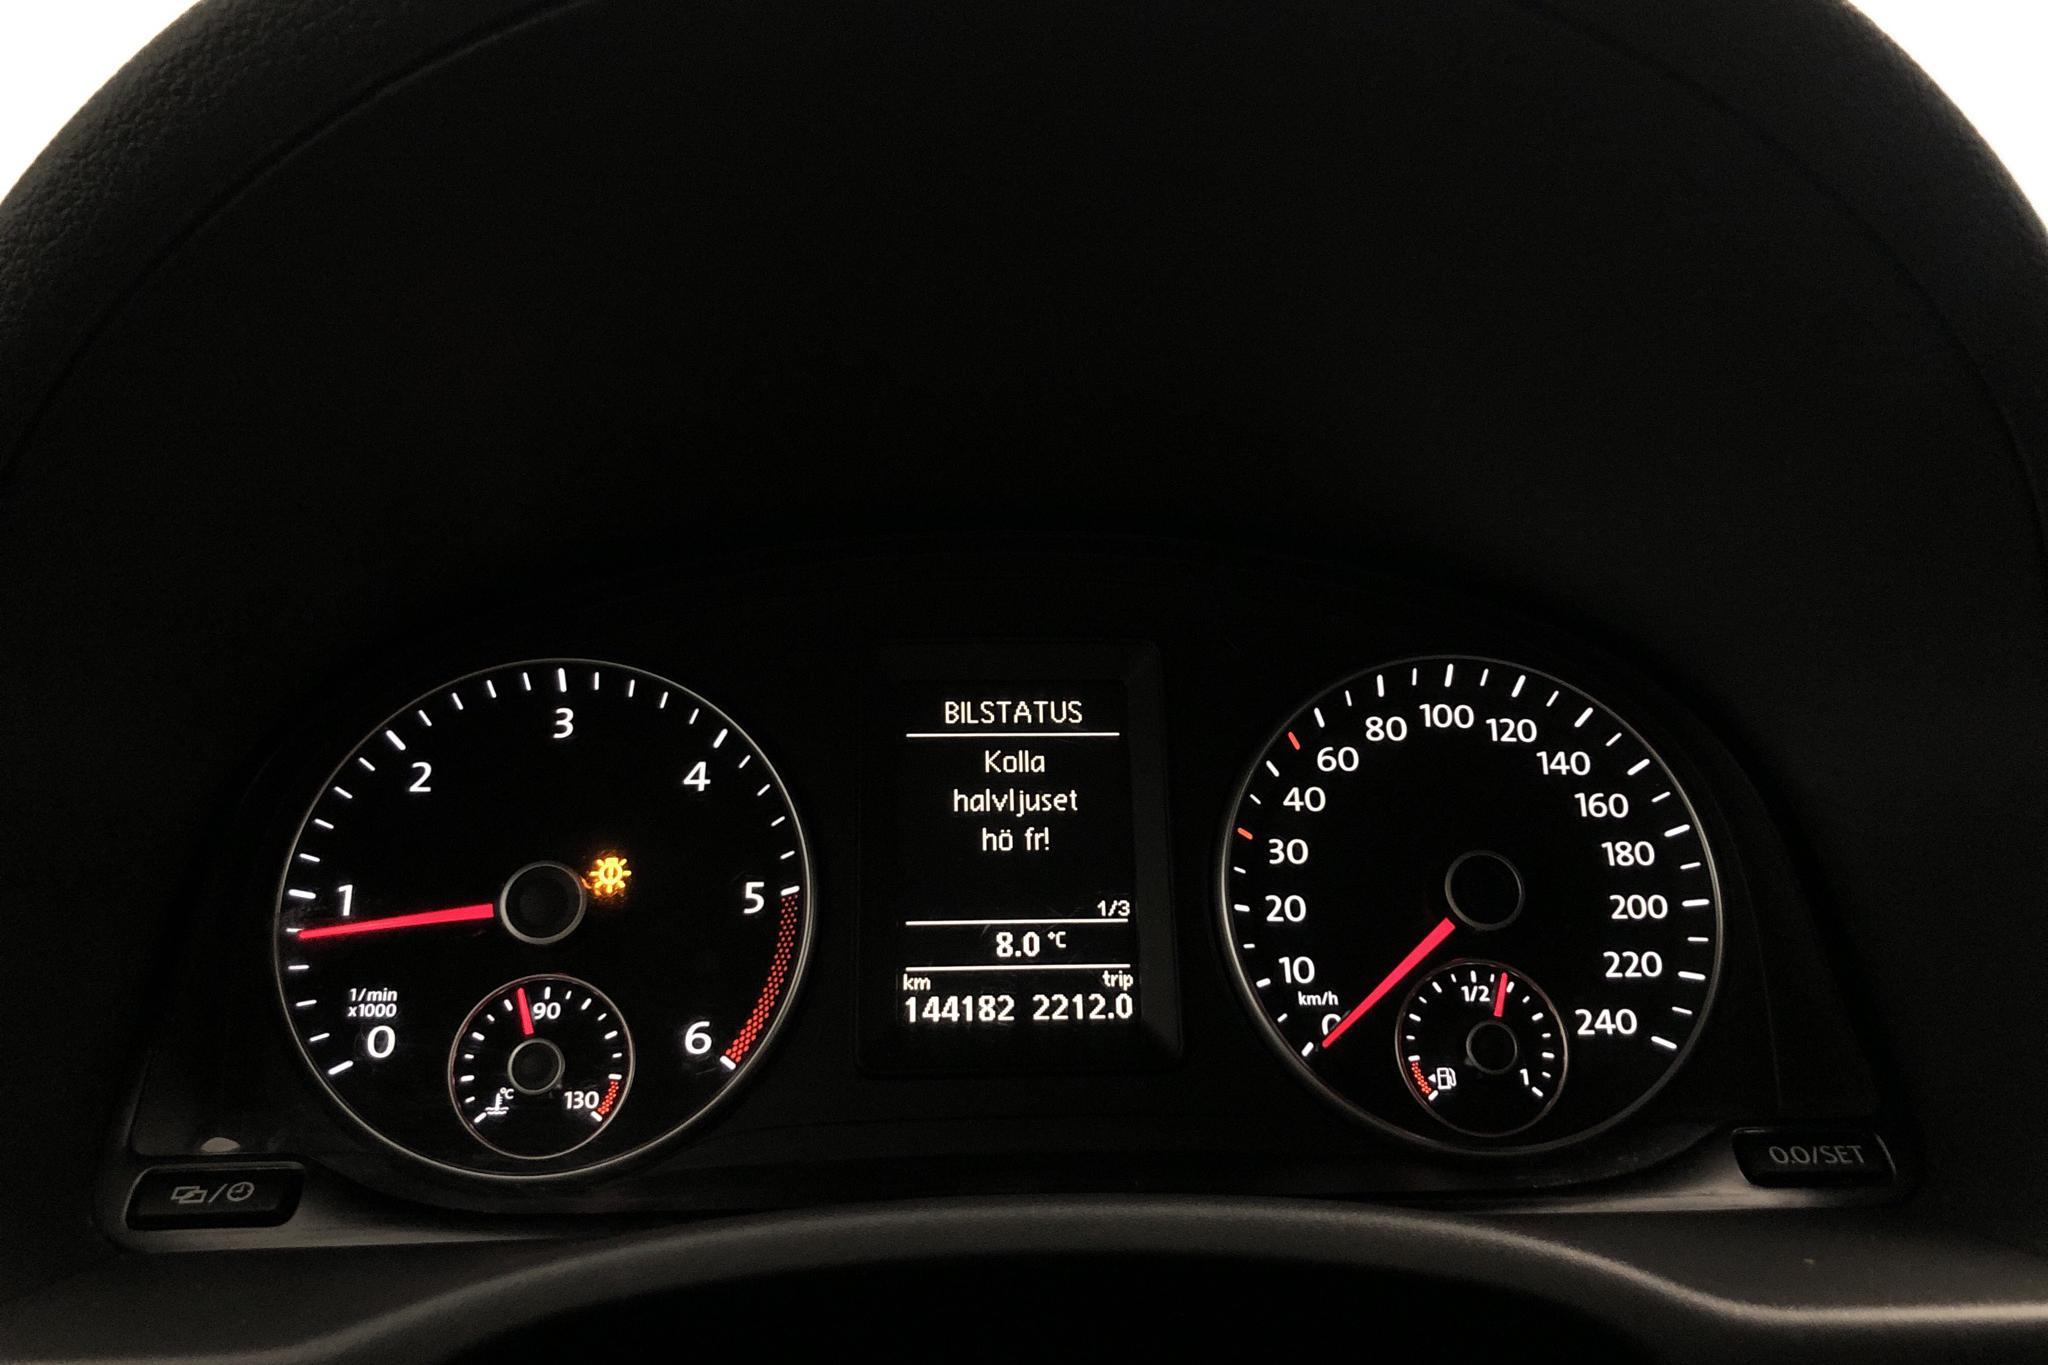 VW Caddy 2.0 TDI Skåp 4-motion (140hk) - 144 170 km - Automatic - white - 2015